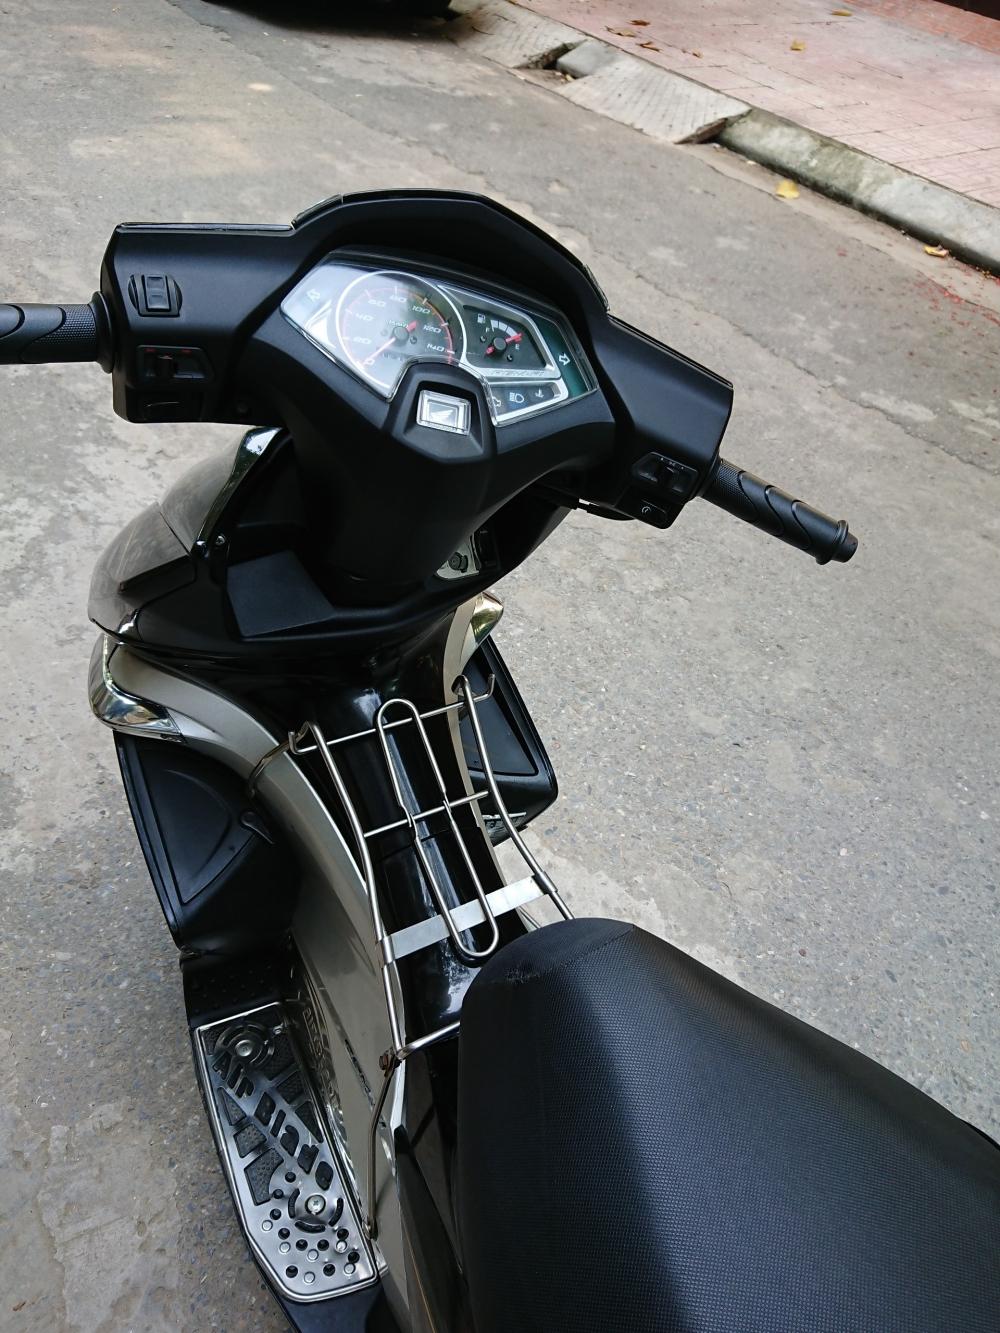 Rao ban Honda Airblade fi 2011 chuan doi cuoi nguyen ban cuc chat - 4